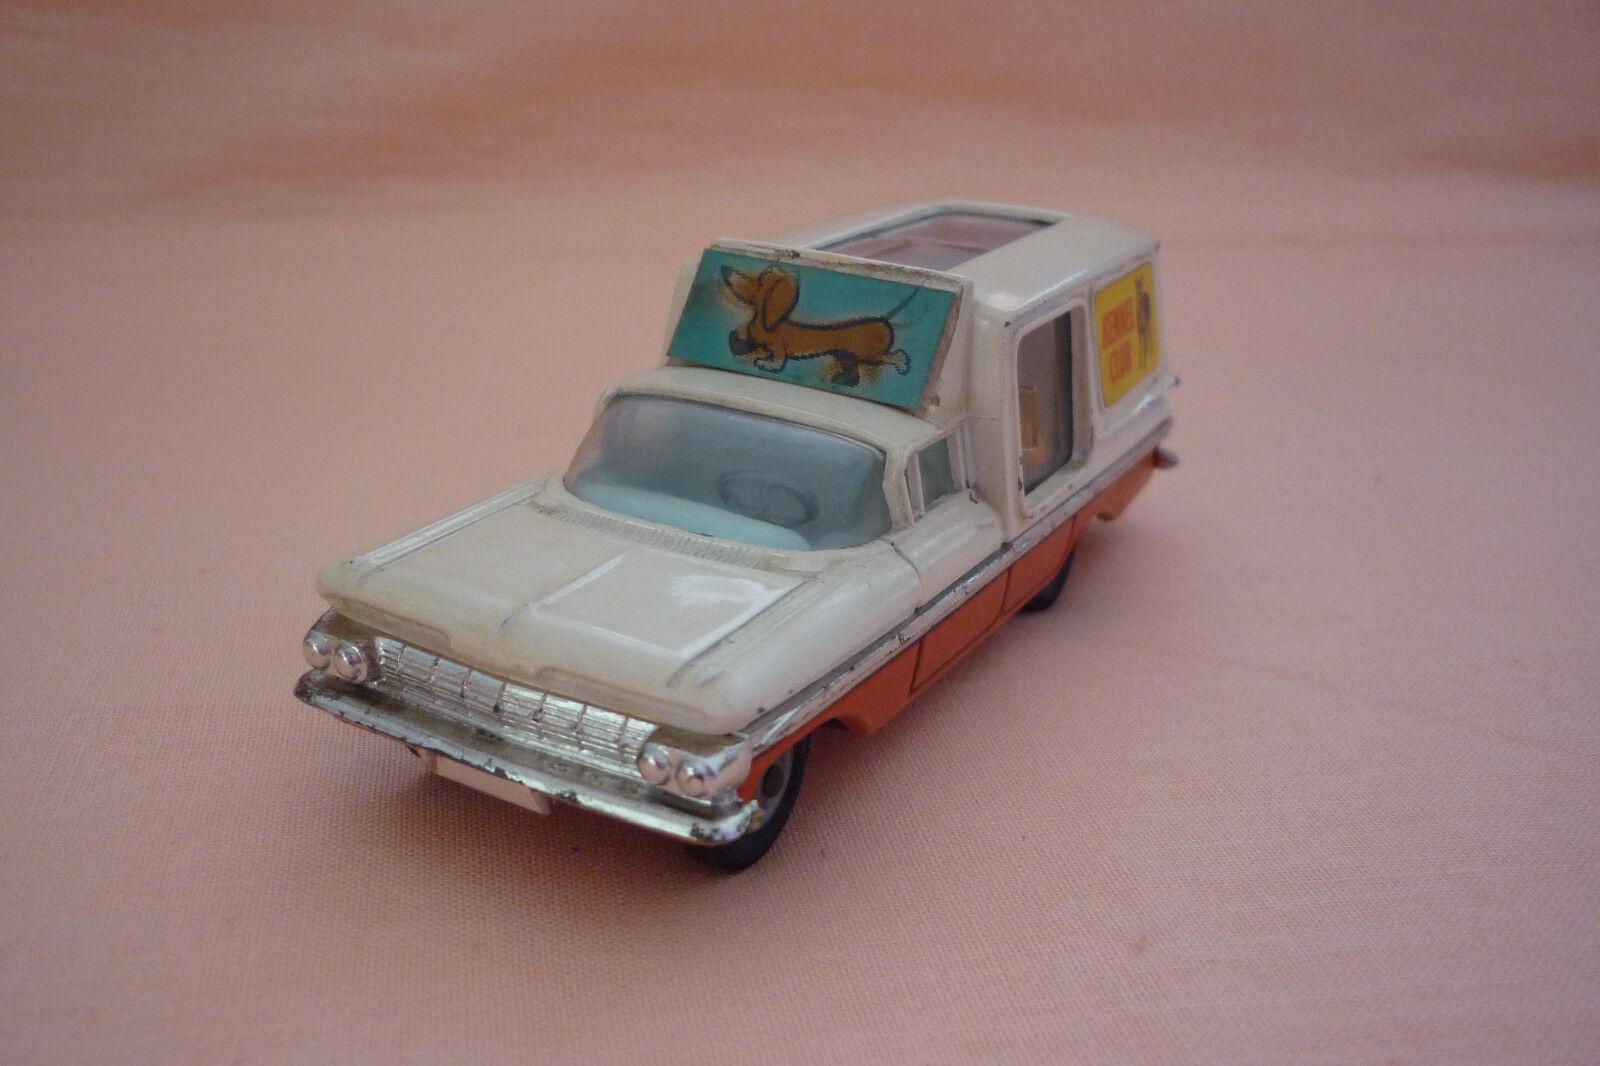 Corgi Toys-Vintage Metal Model-Chevrolet Impala-Kennel Club -